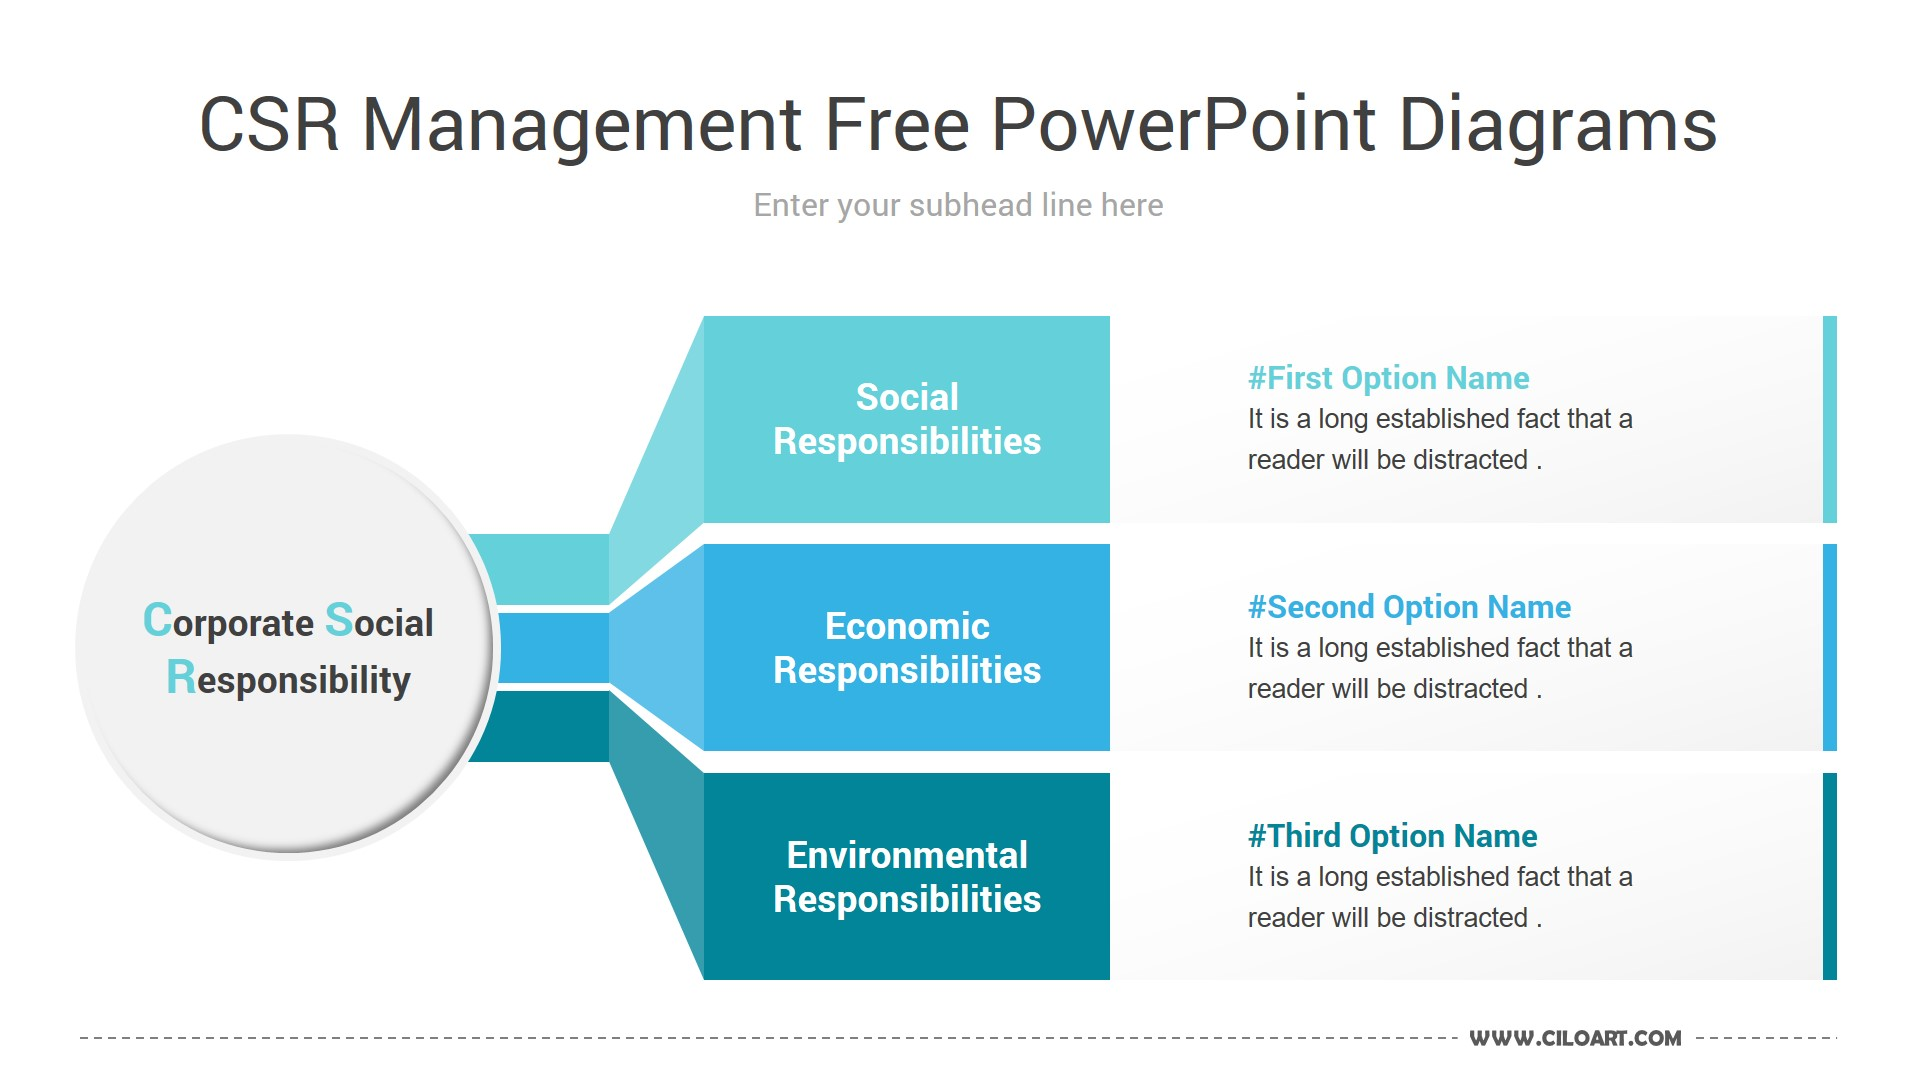 CSR Management Free PowerPoint Diagrams